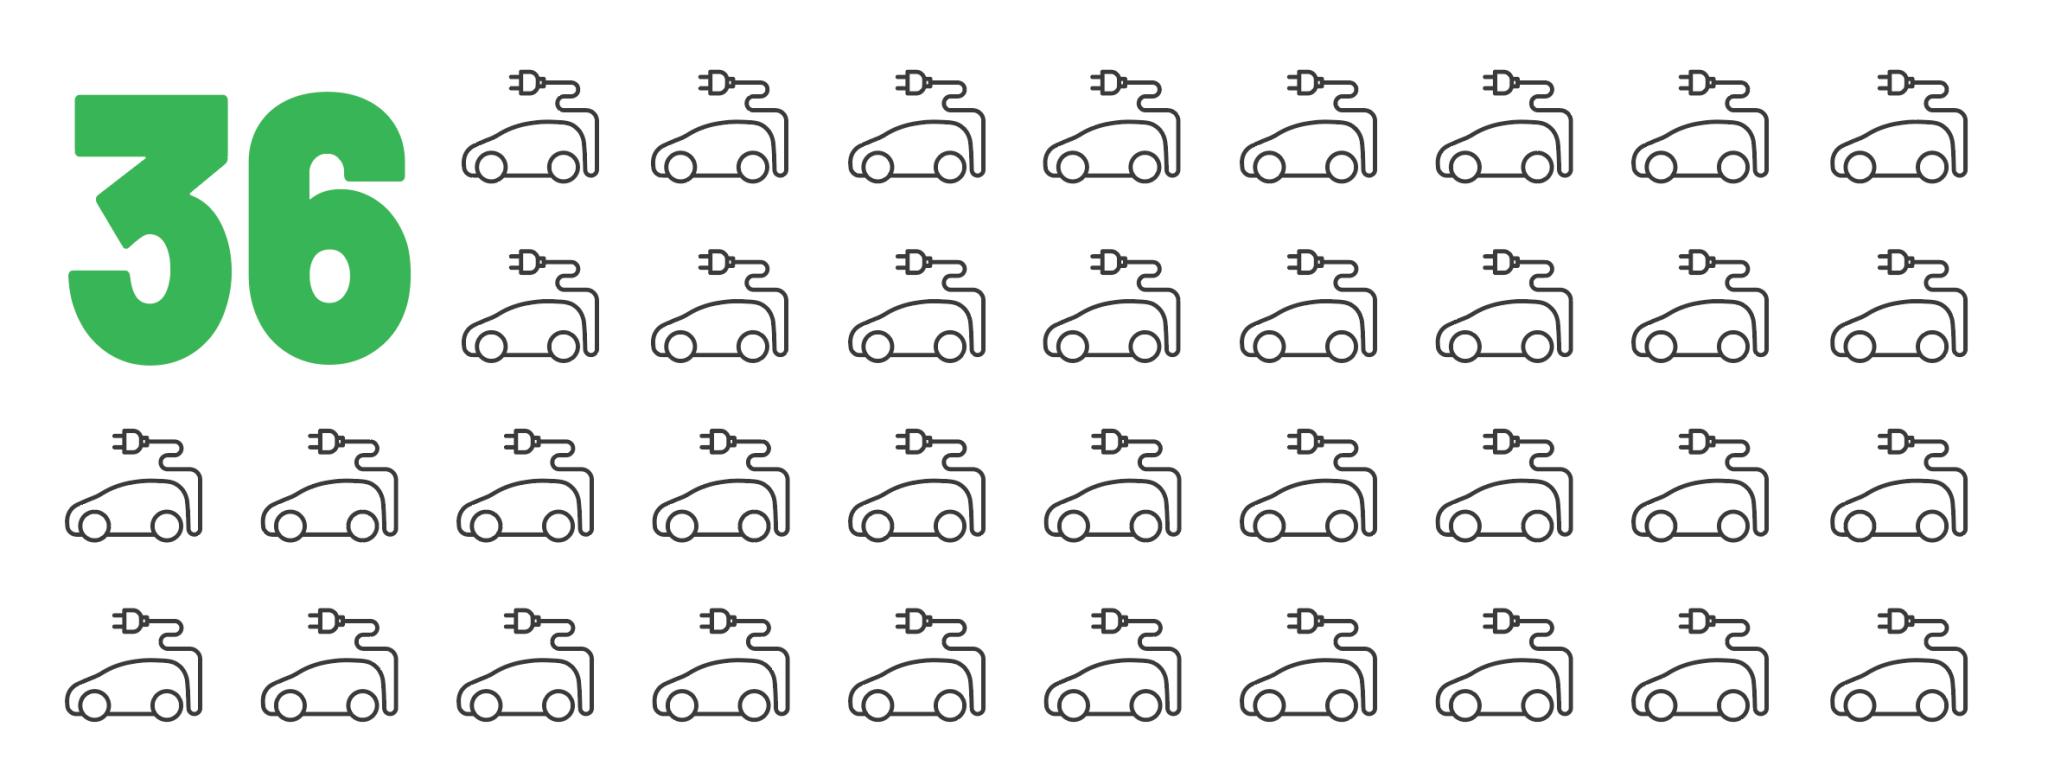 36 electric vehicles